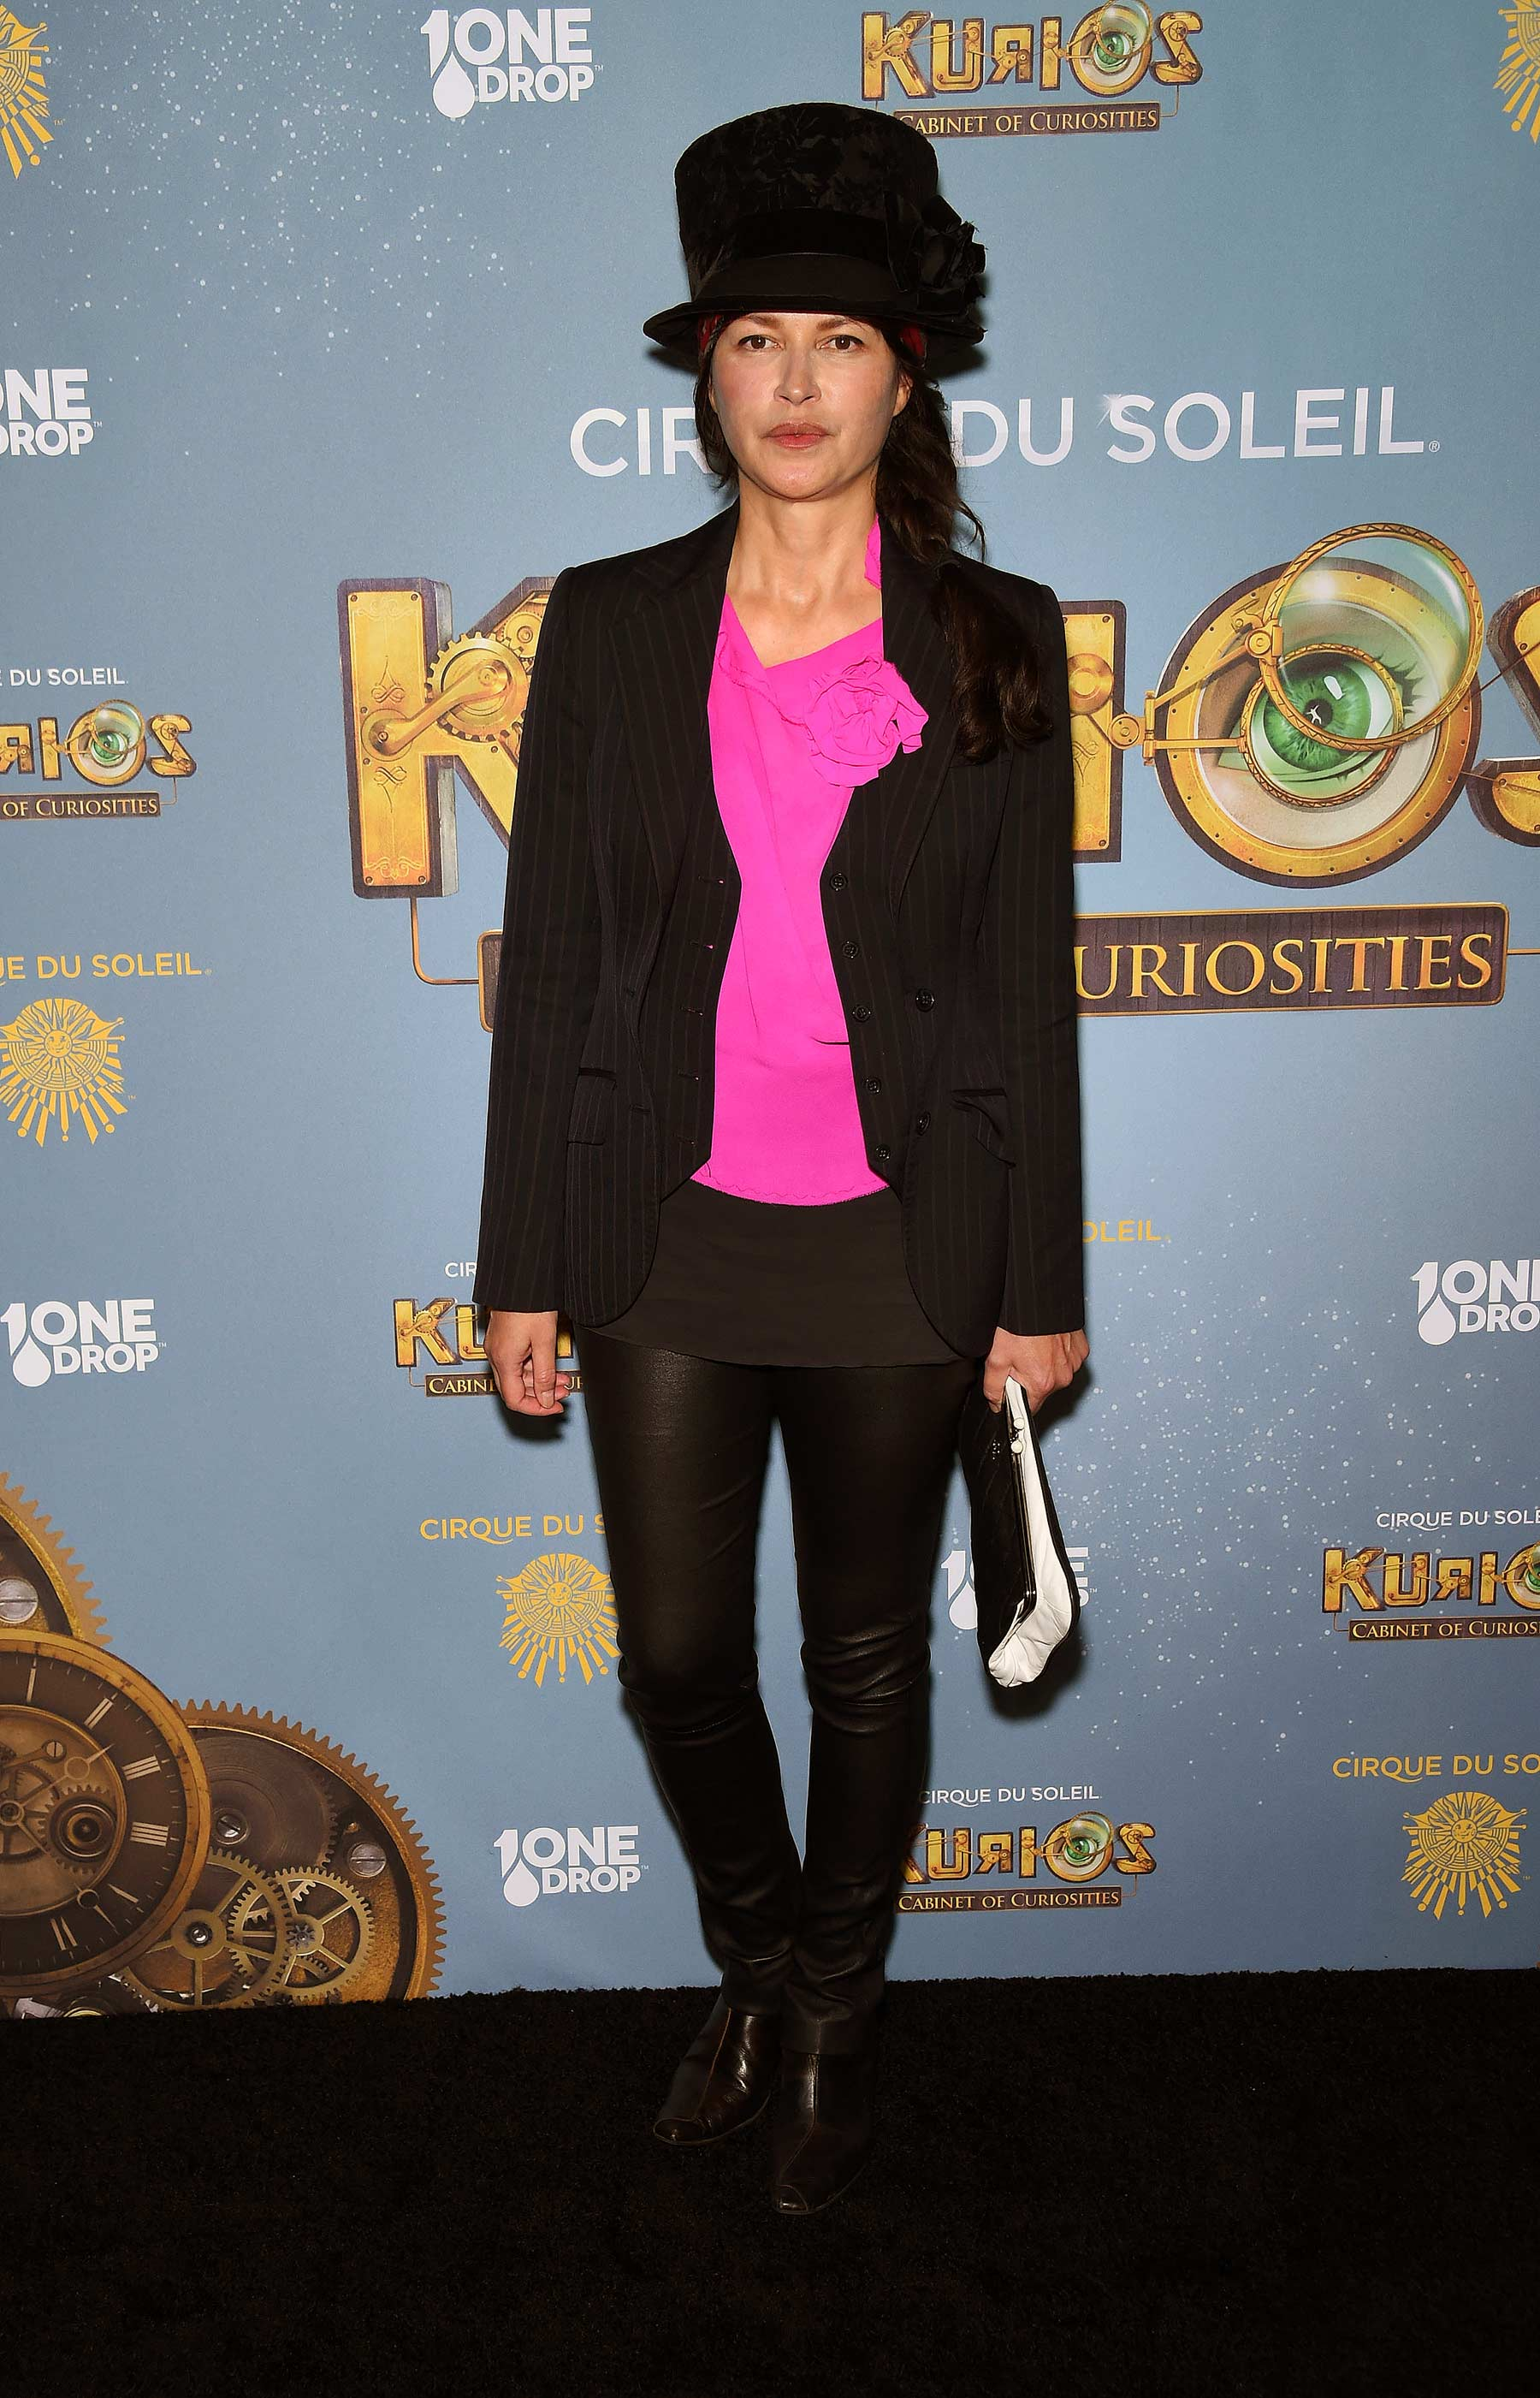 Karina Lombard attends Cirque Du Soleil Kurios Cabinet of Curiosities opening night